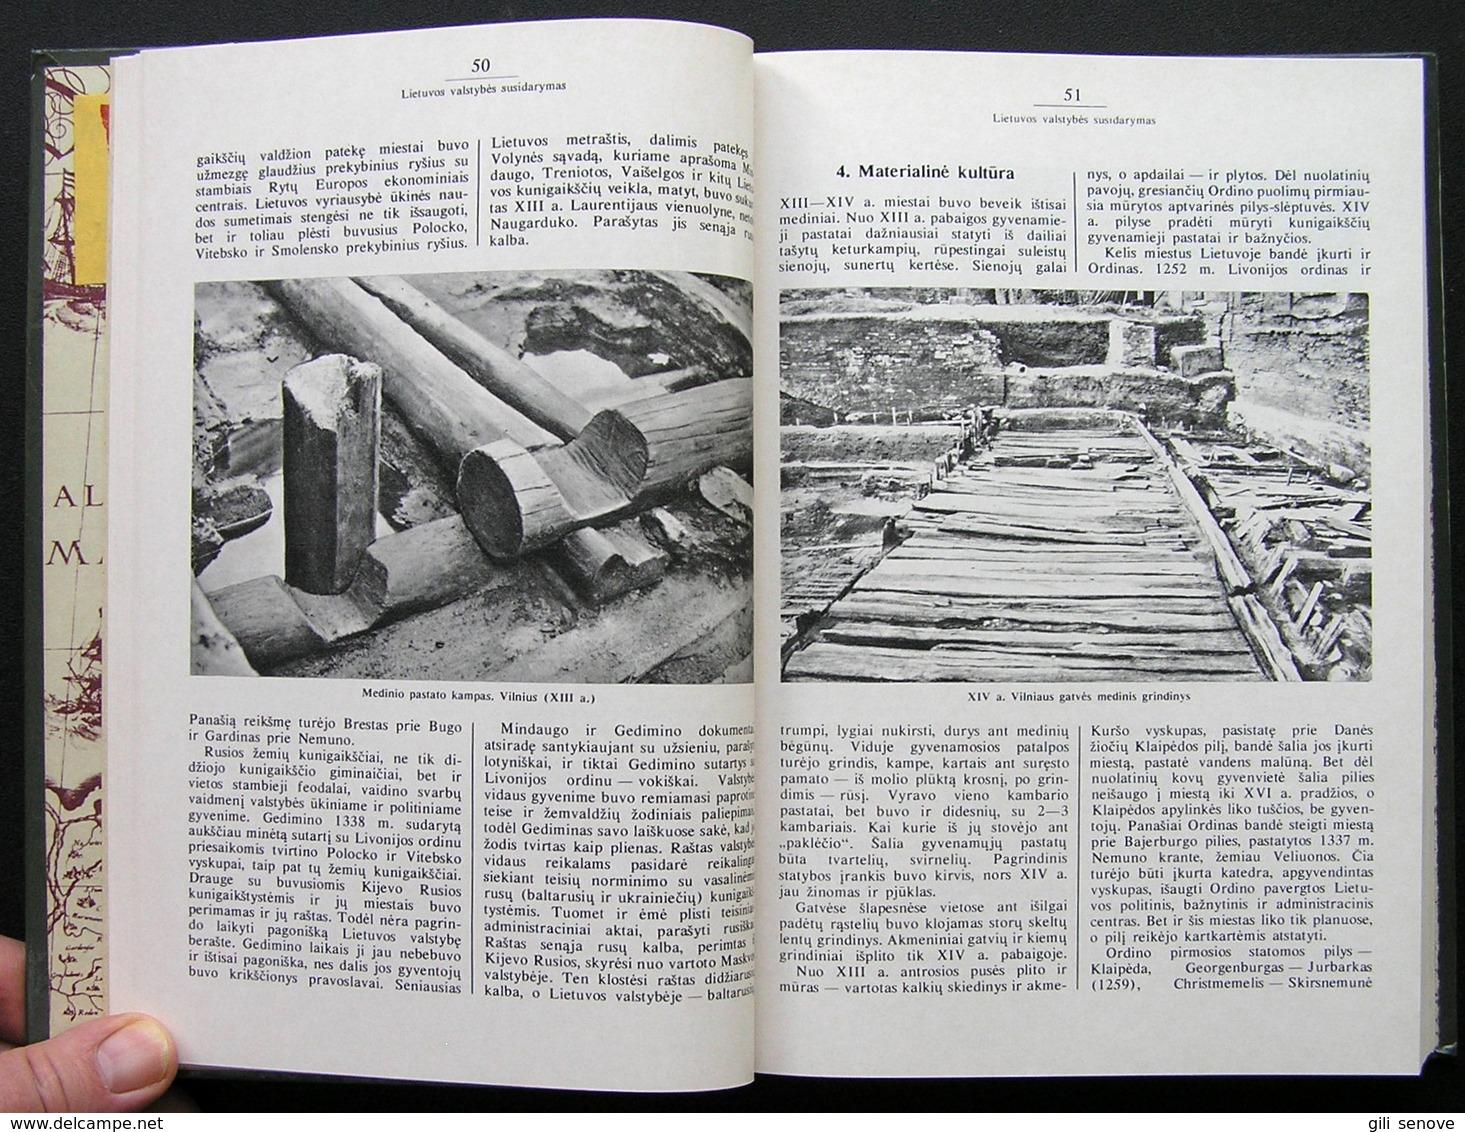 Lithuanian Book / Lietuvos TSR Istorija. Nuo Seniausių Laikų Iki 1917 Metų 1985 - Bücher, Zeitschriften, Comics